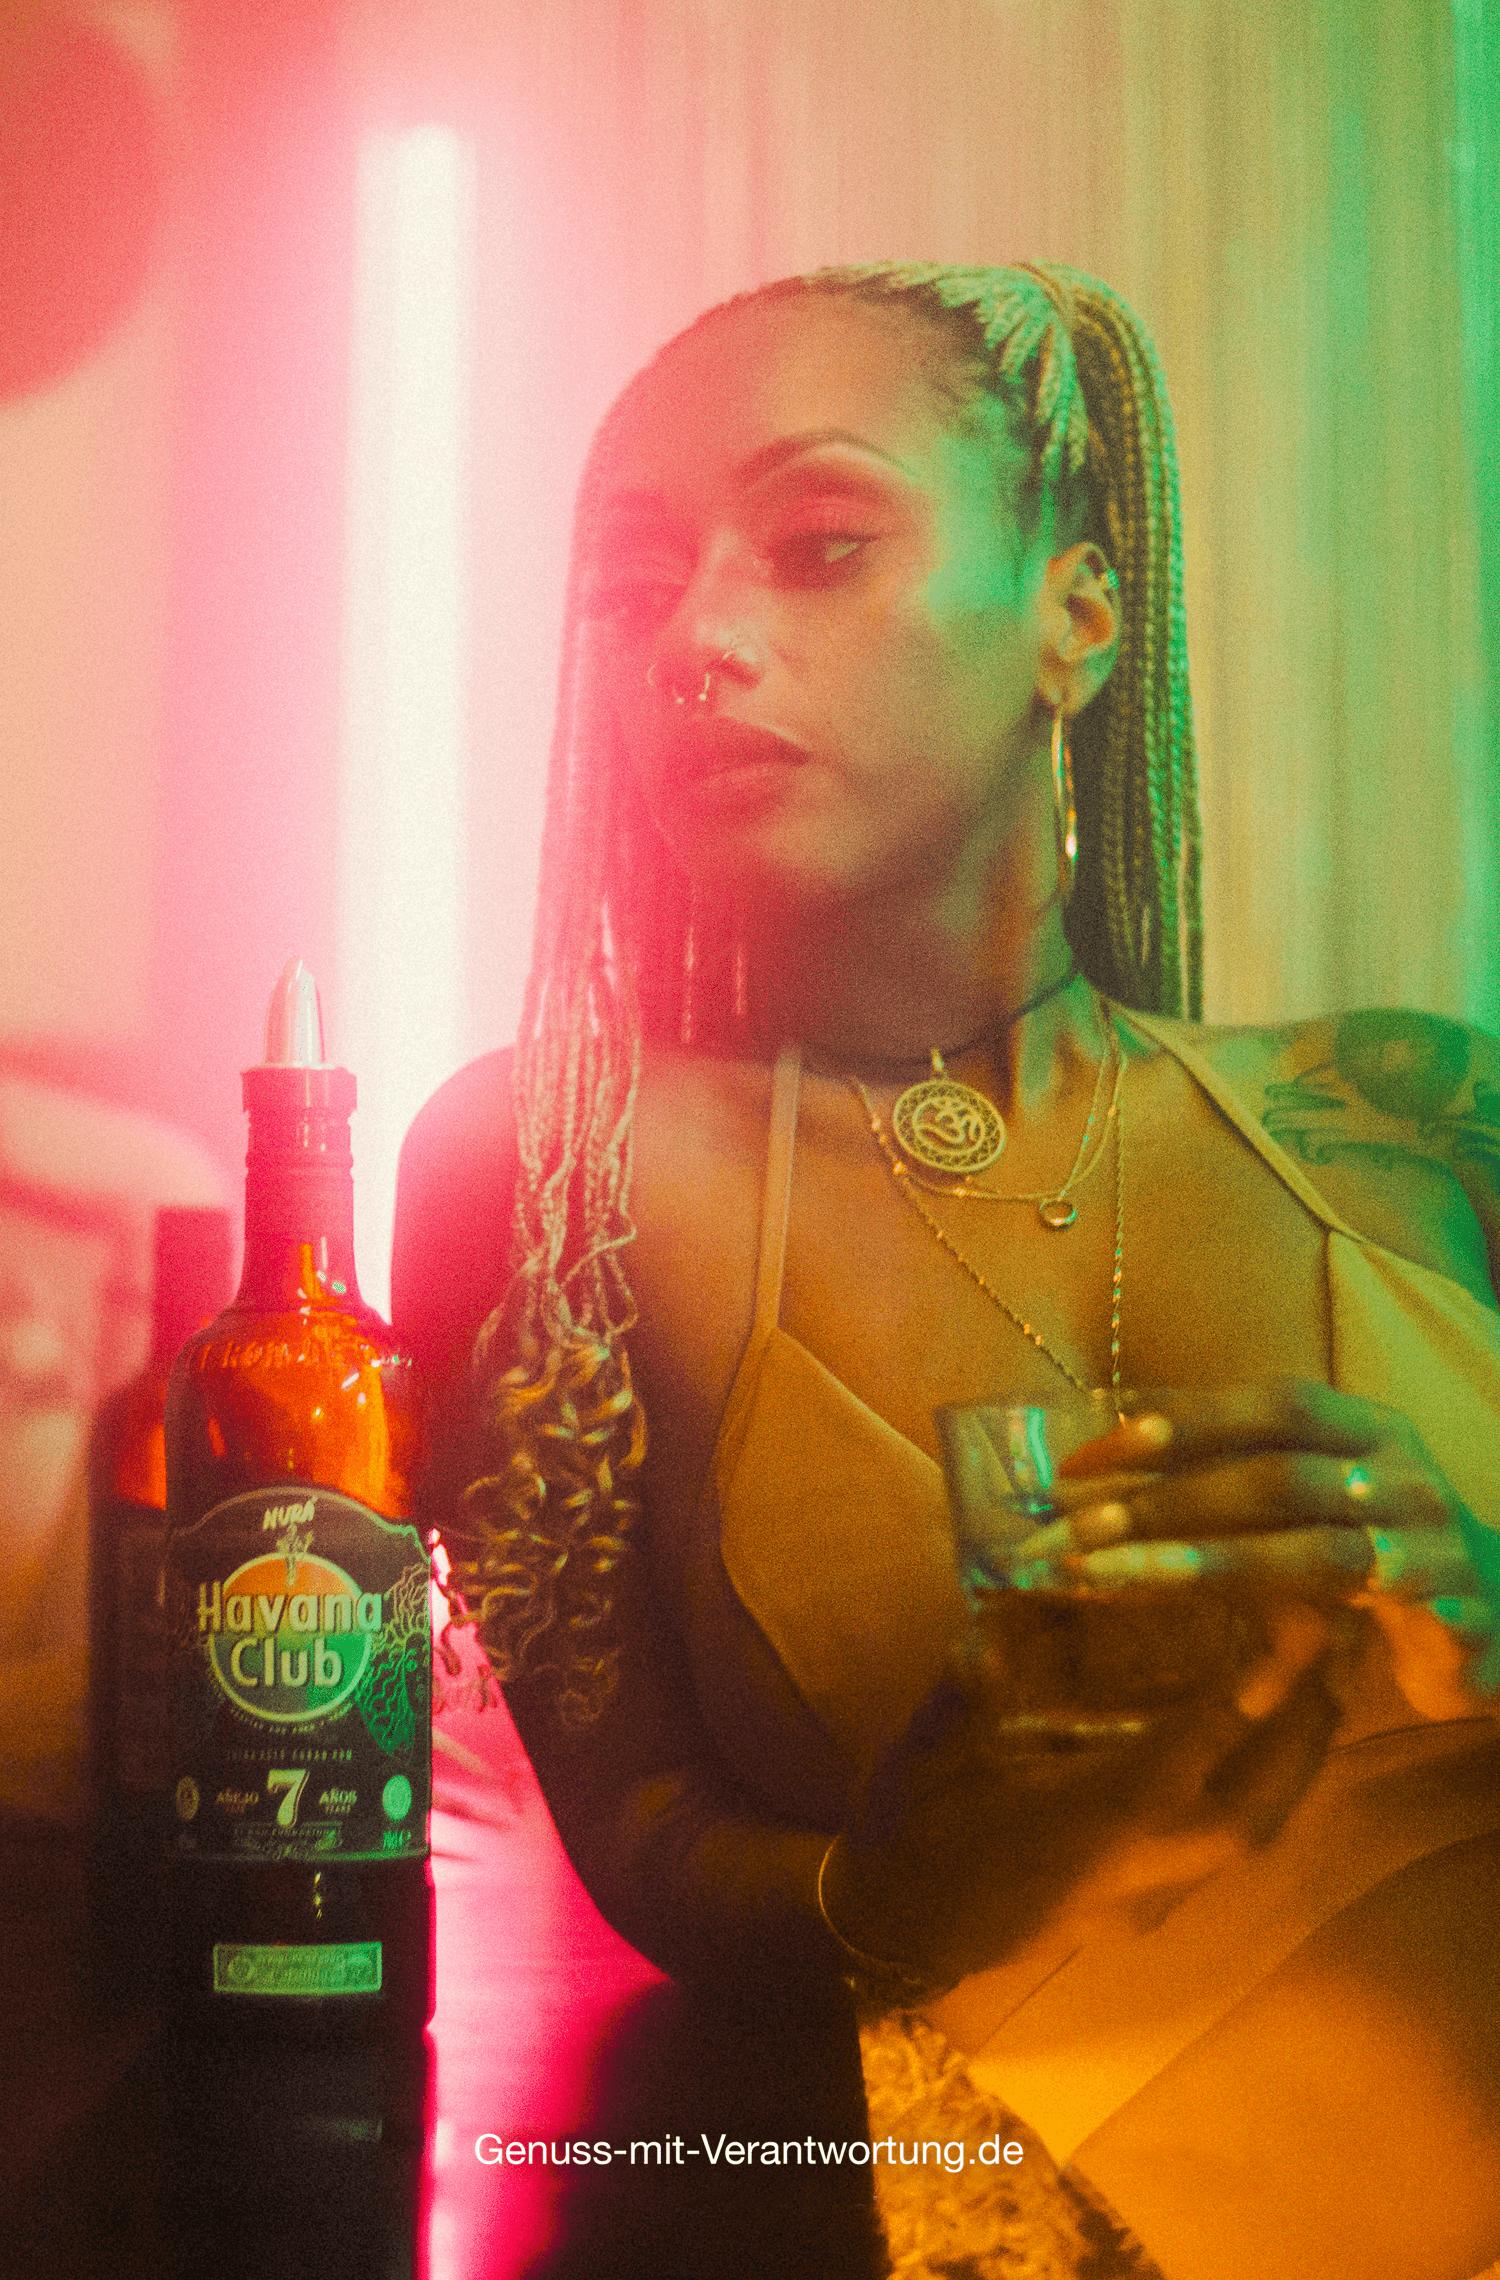 Rapperin Nura kooperiert mir Havana Club Rum